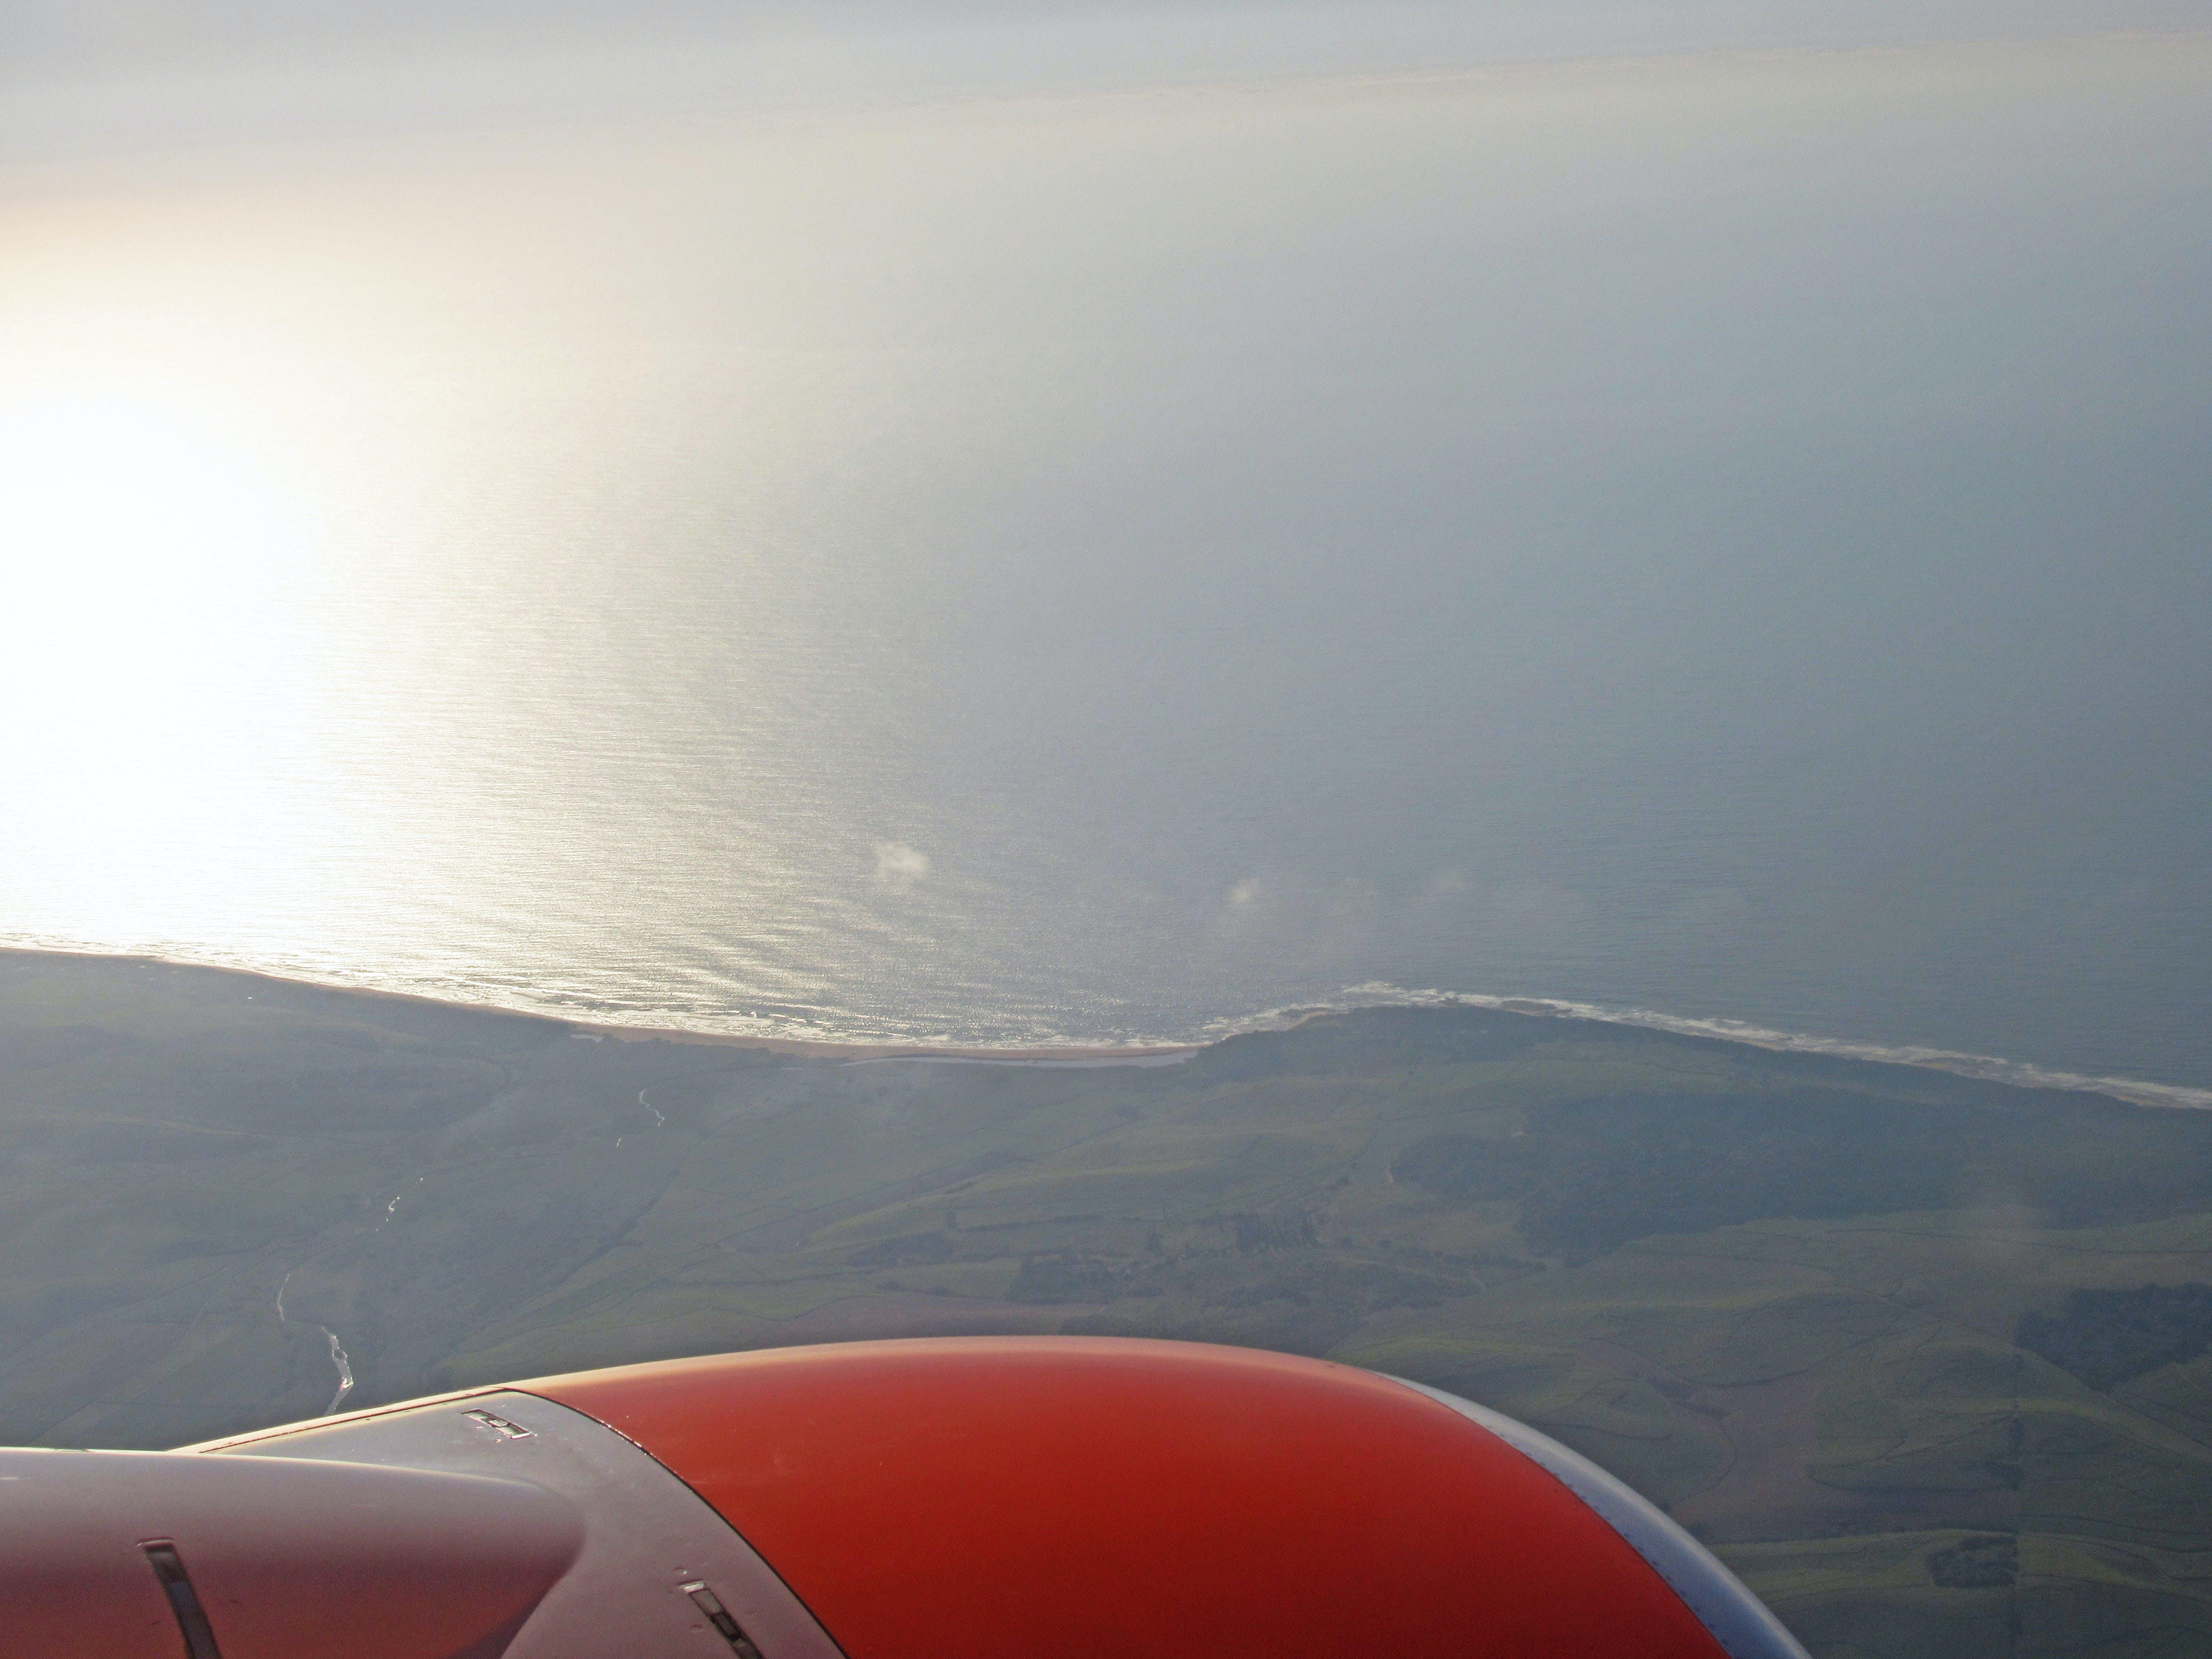 Free stock photo of aerial view, aeroplane, nature, ocean